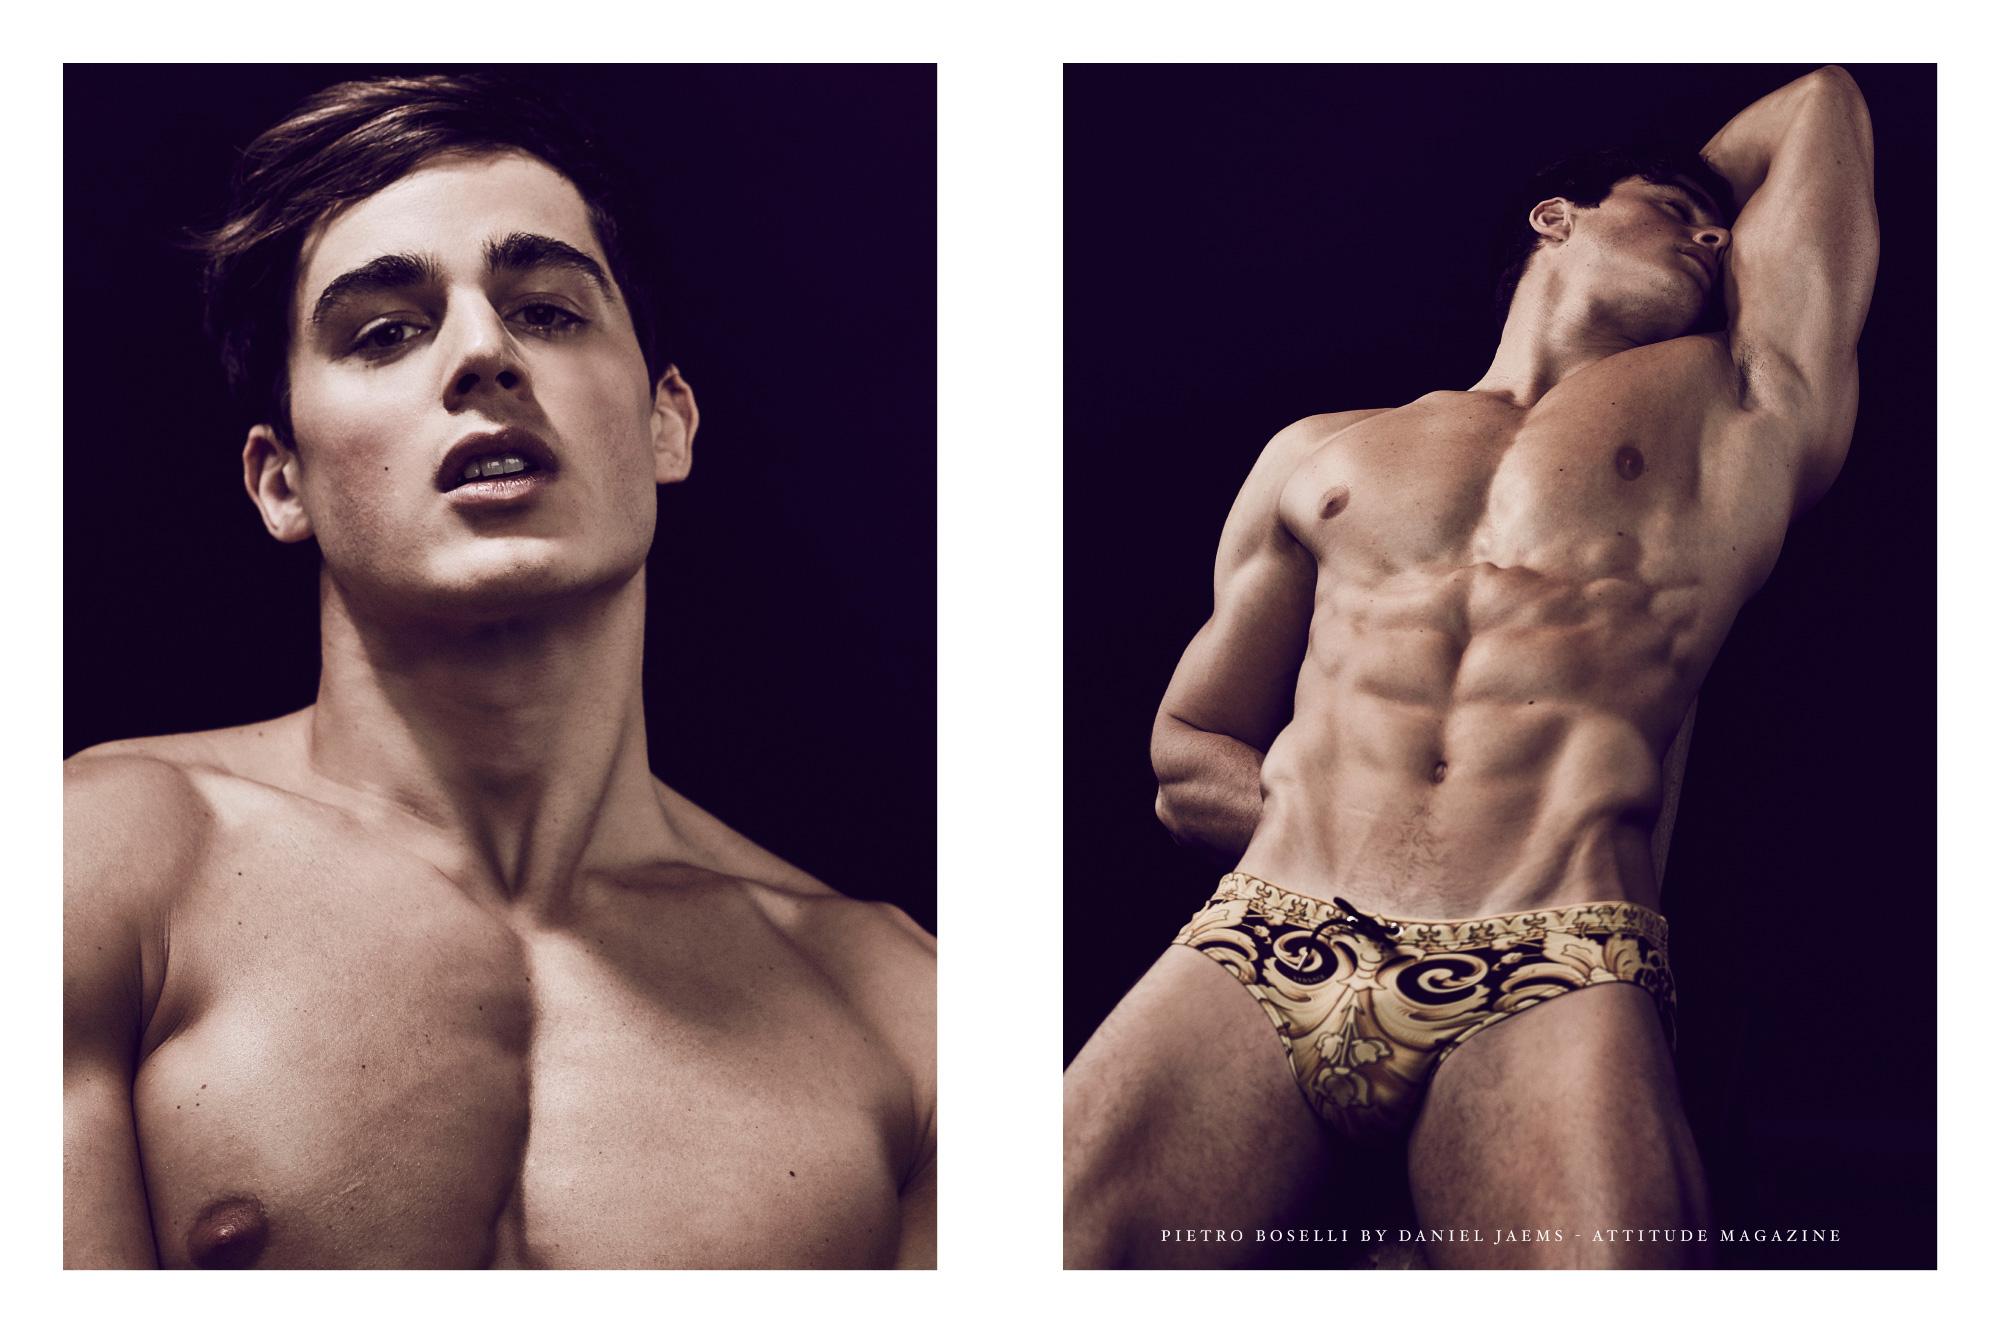 Pietro-Boselli-by-Daniel-Jaems-for-Attitude-Magazine-15